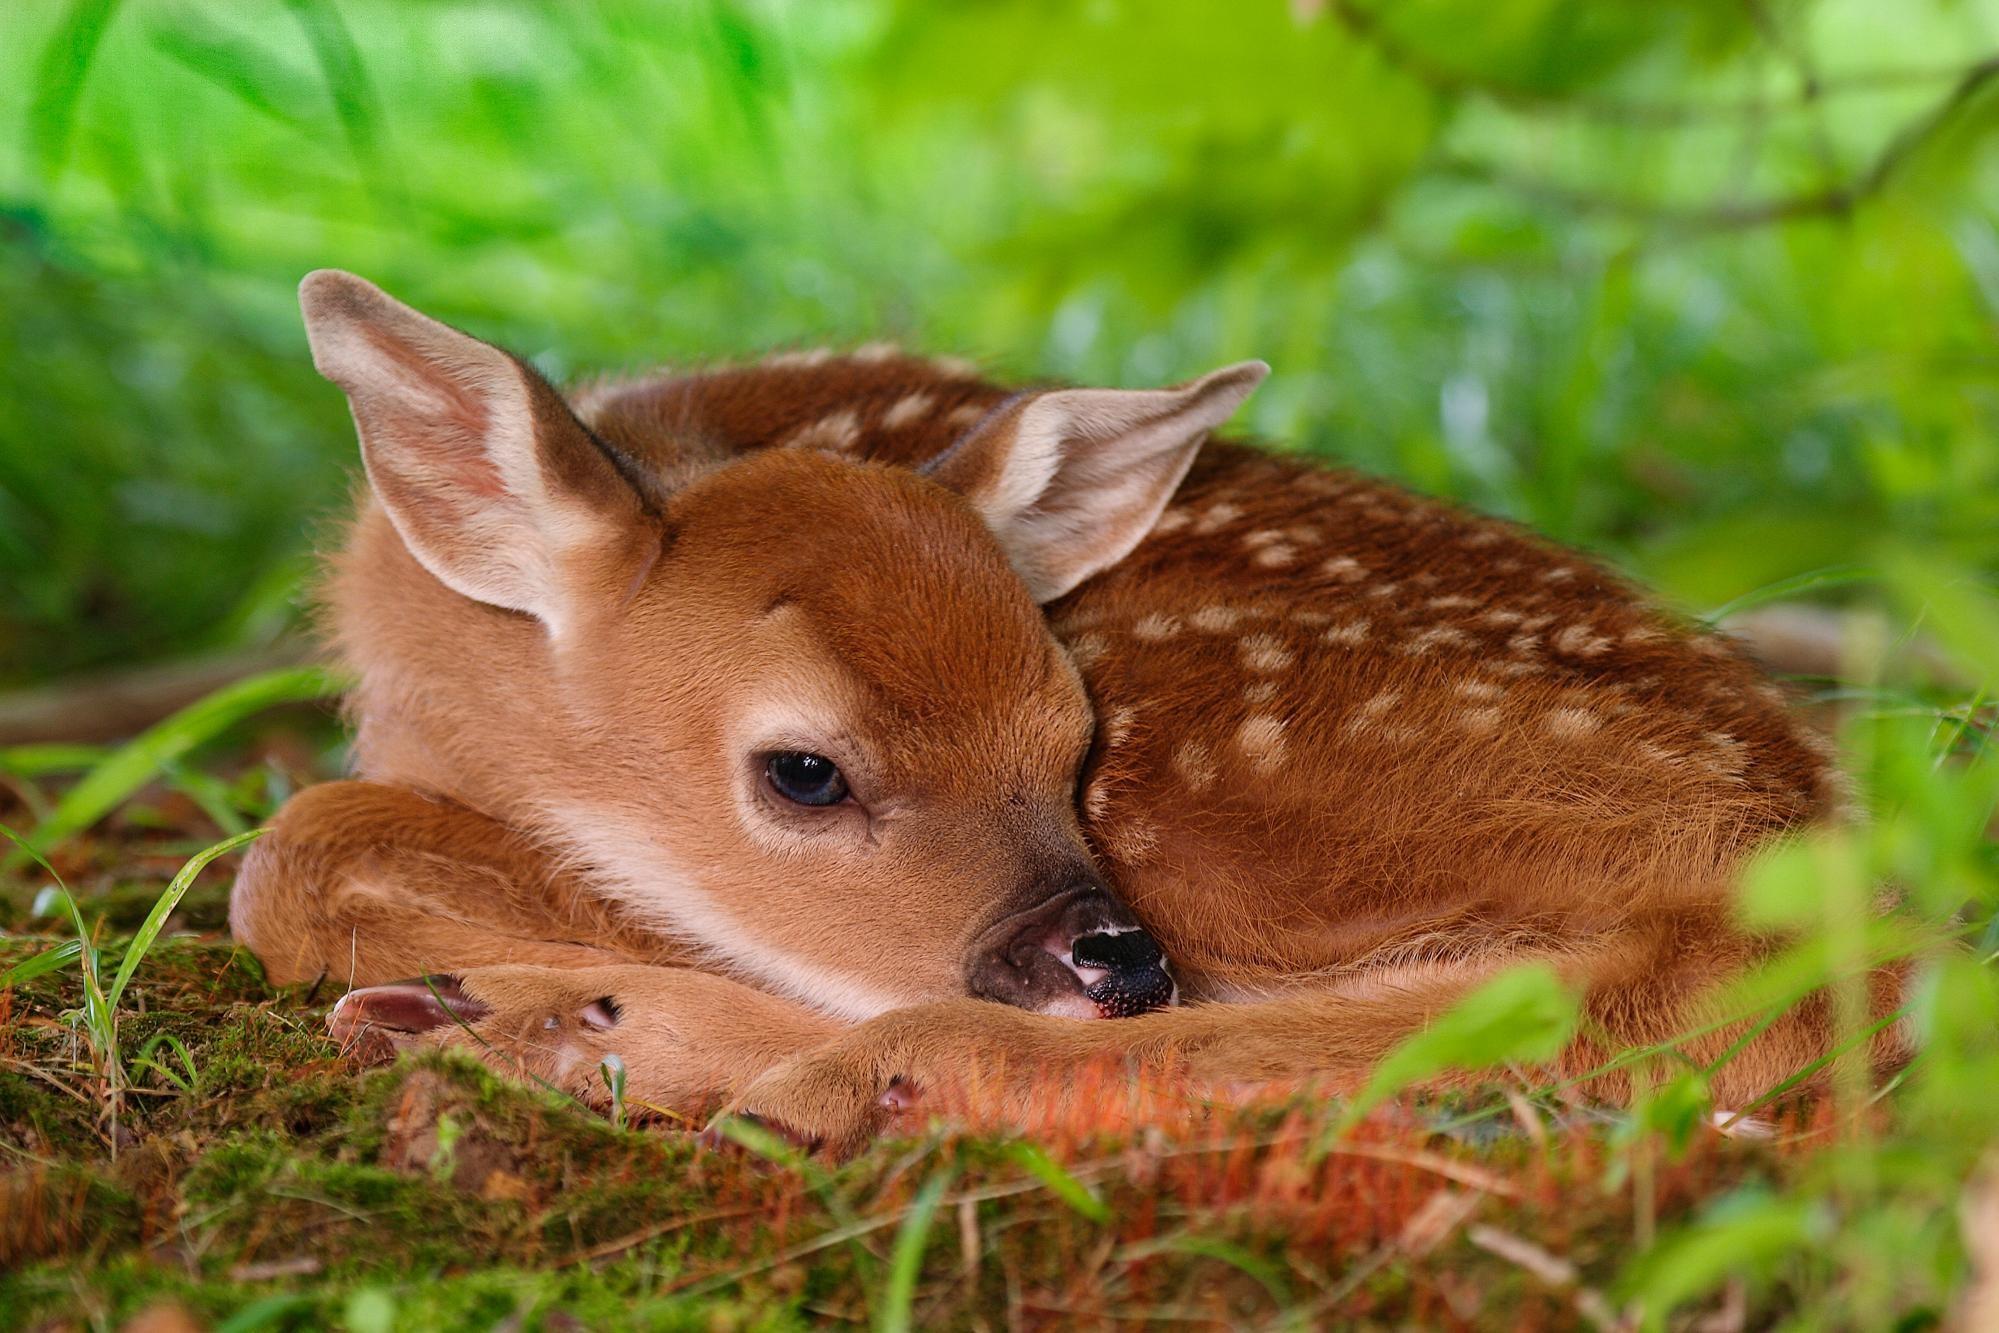 Baby Animal Wallpaper For Desktop: Cute Baby Animal 2018 Wallpaper (72+ Pictures